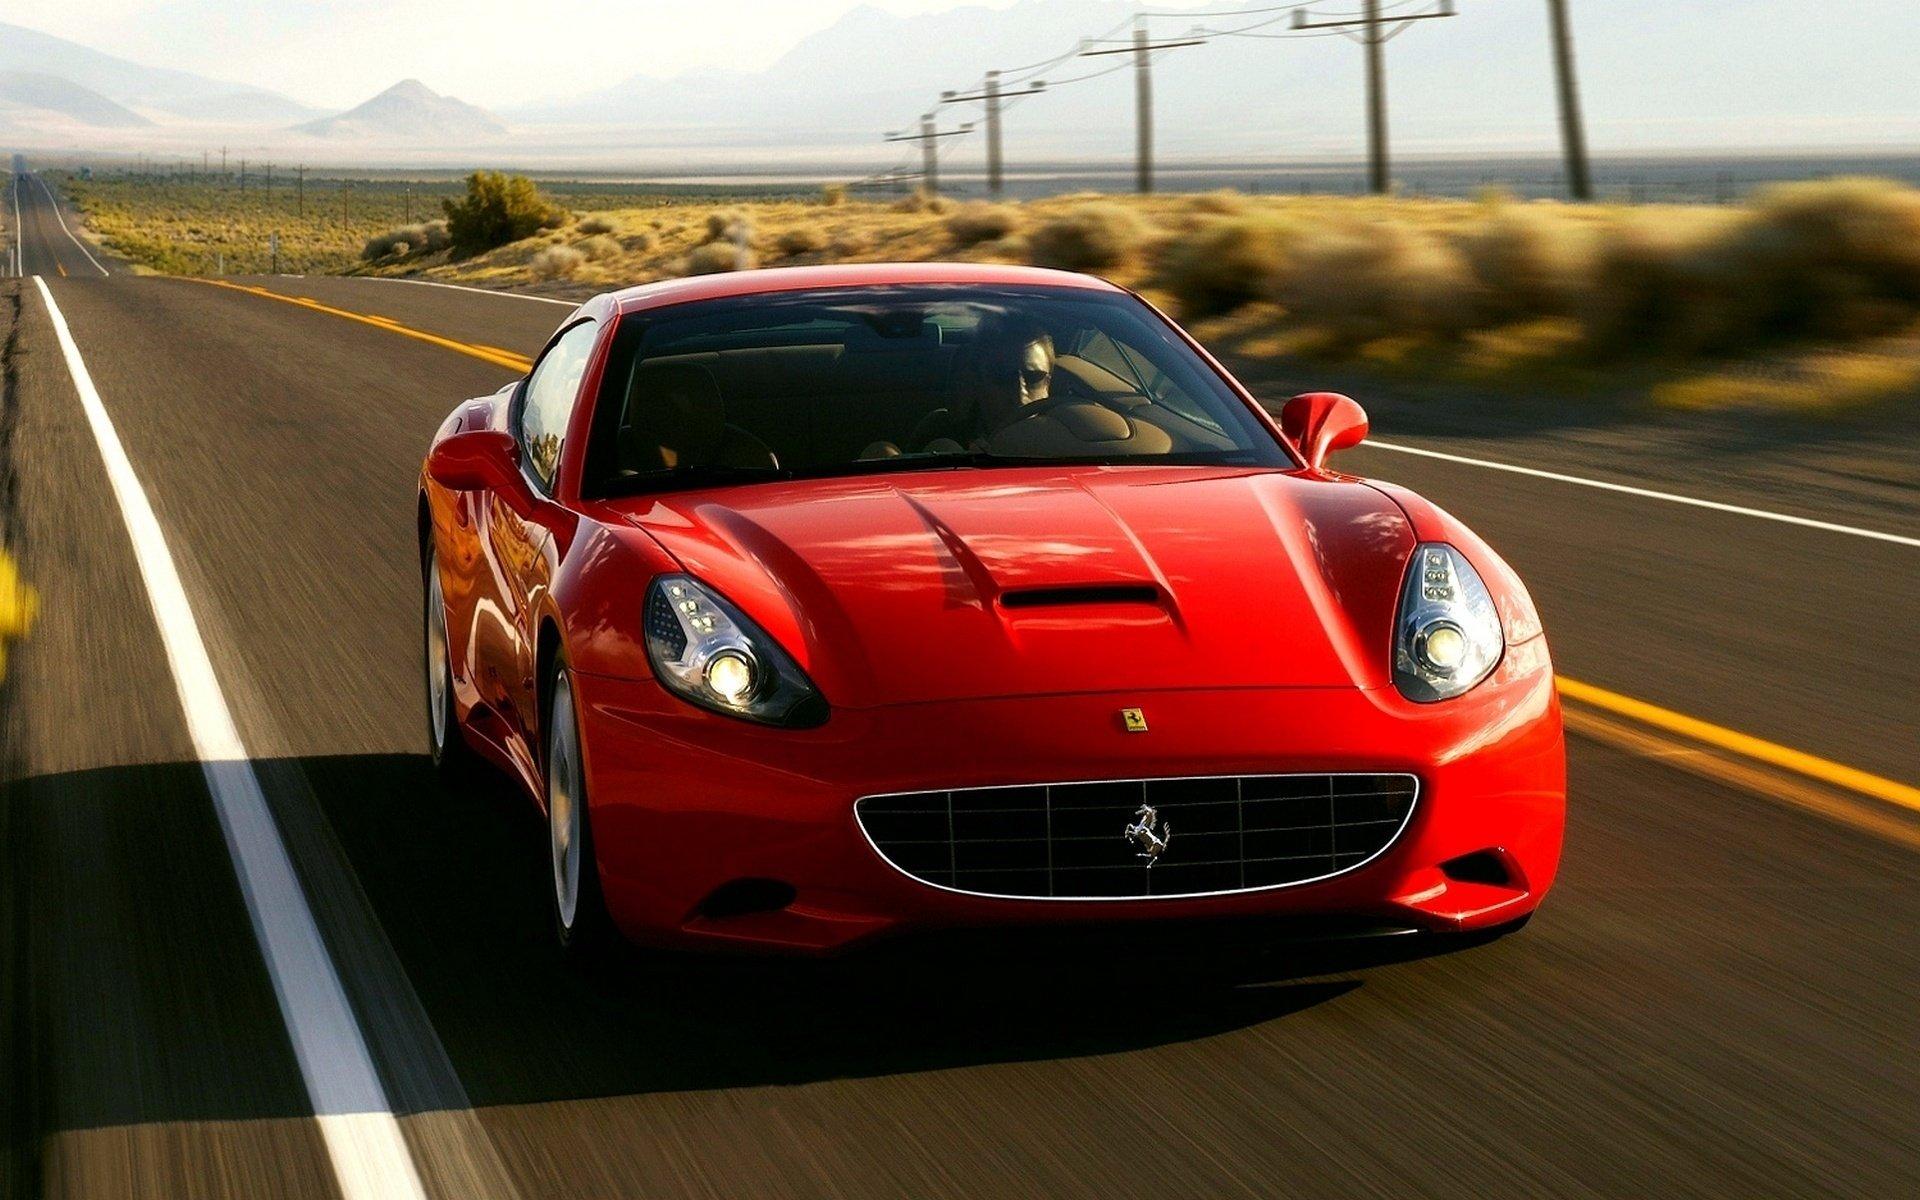 per detail california cover of at car t for month buy used certified ferrari